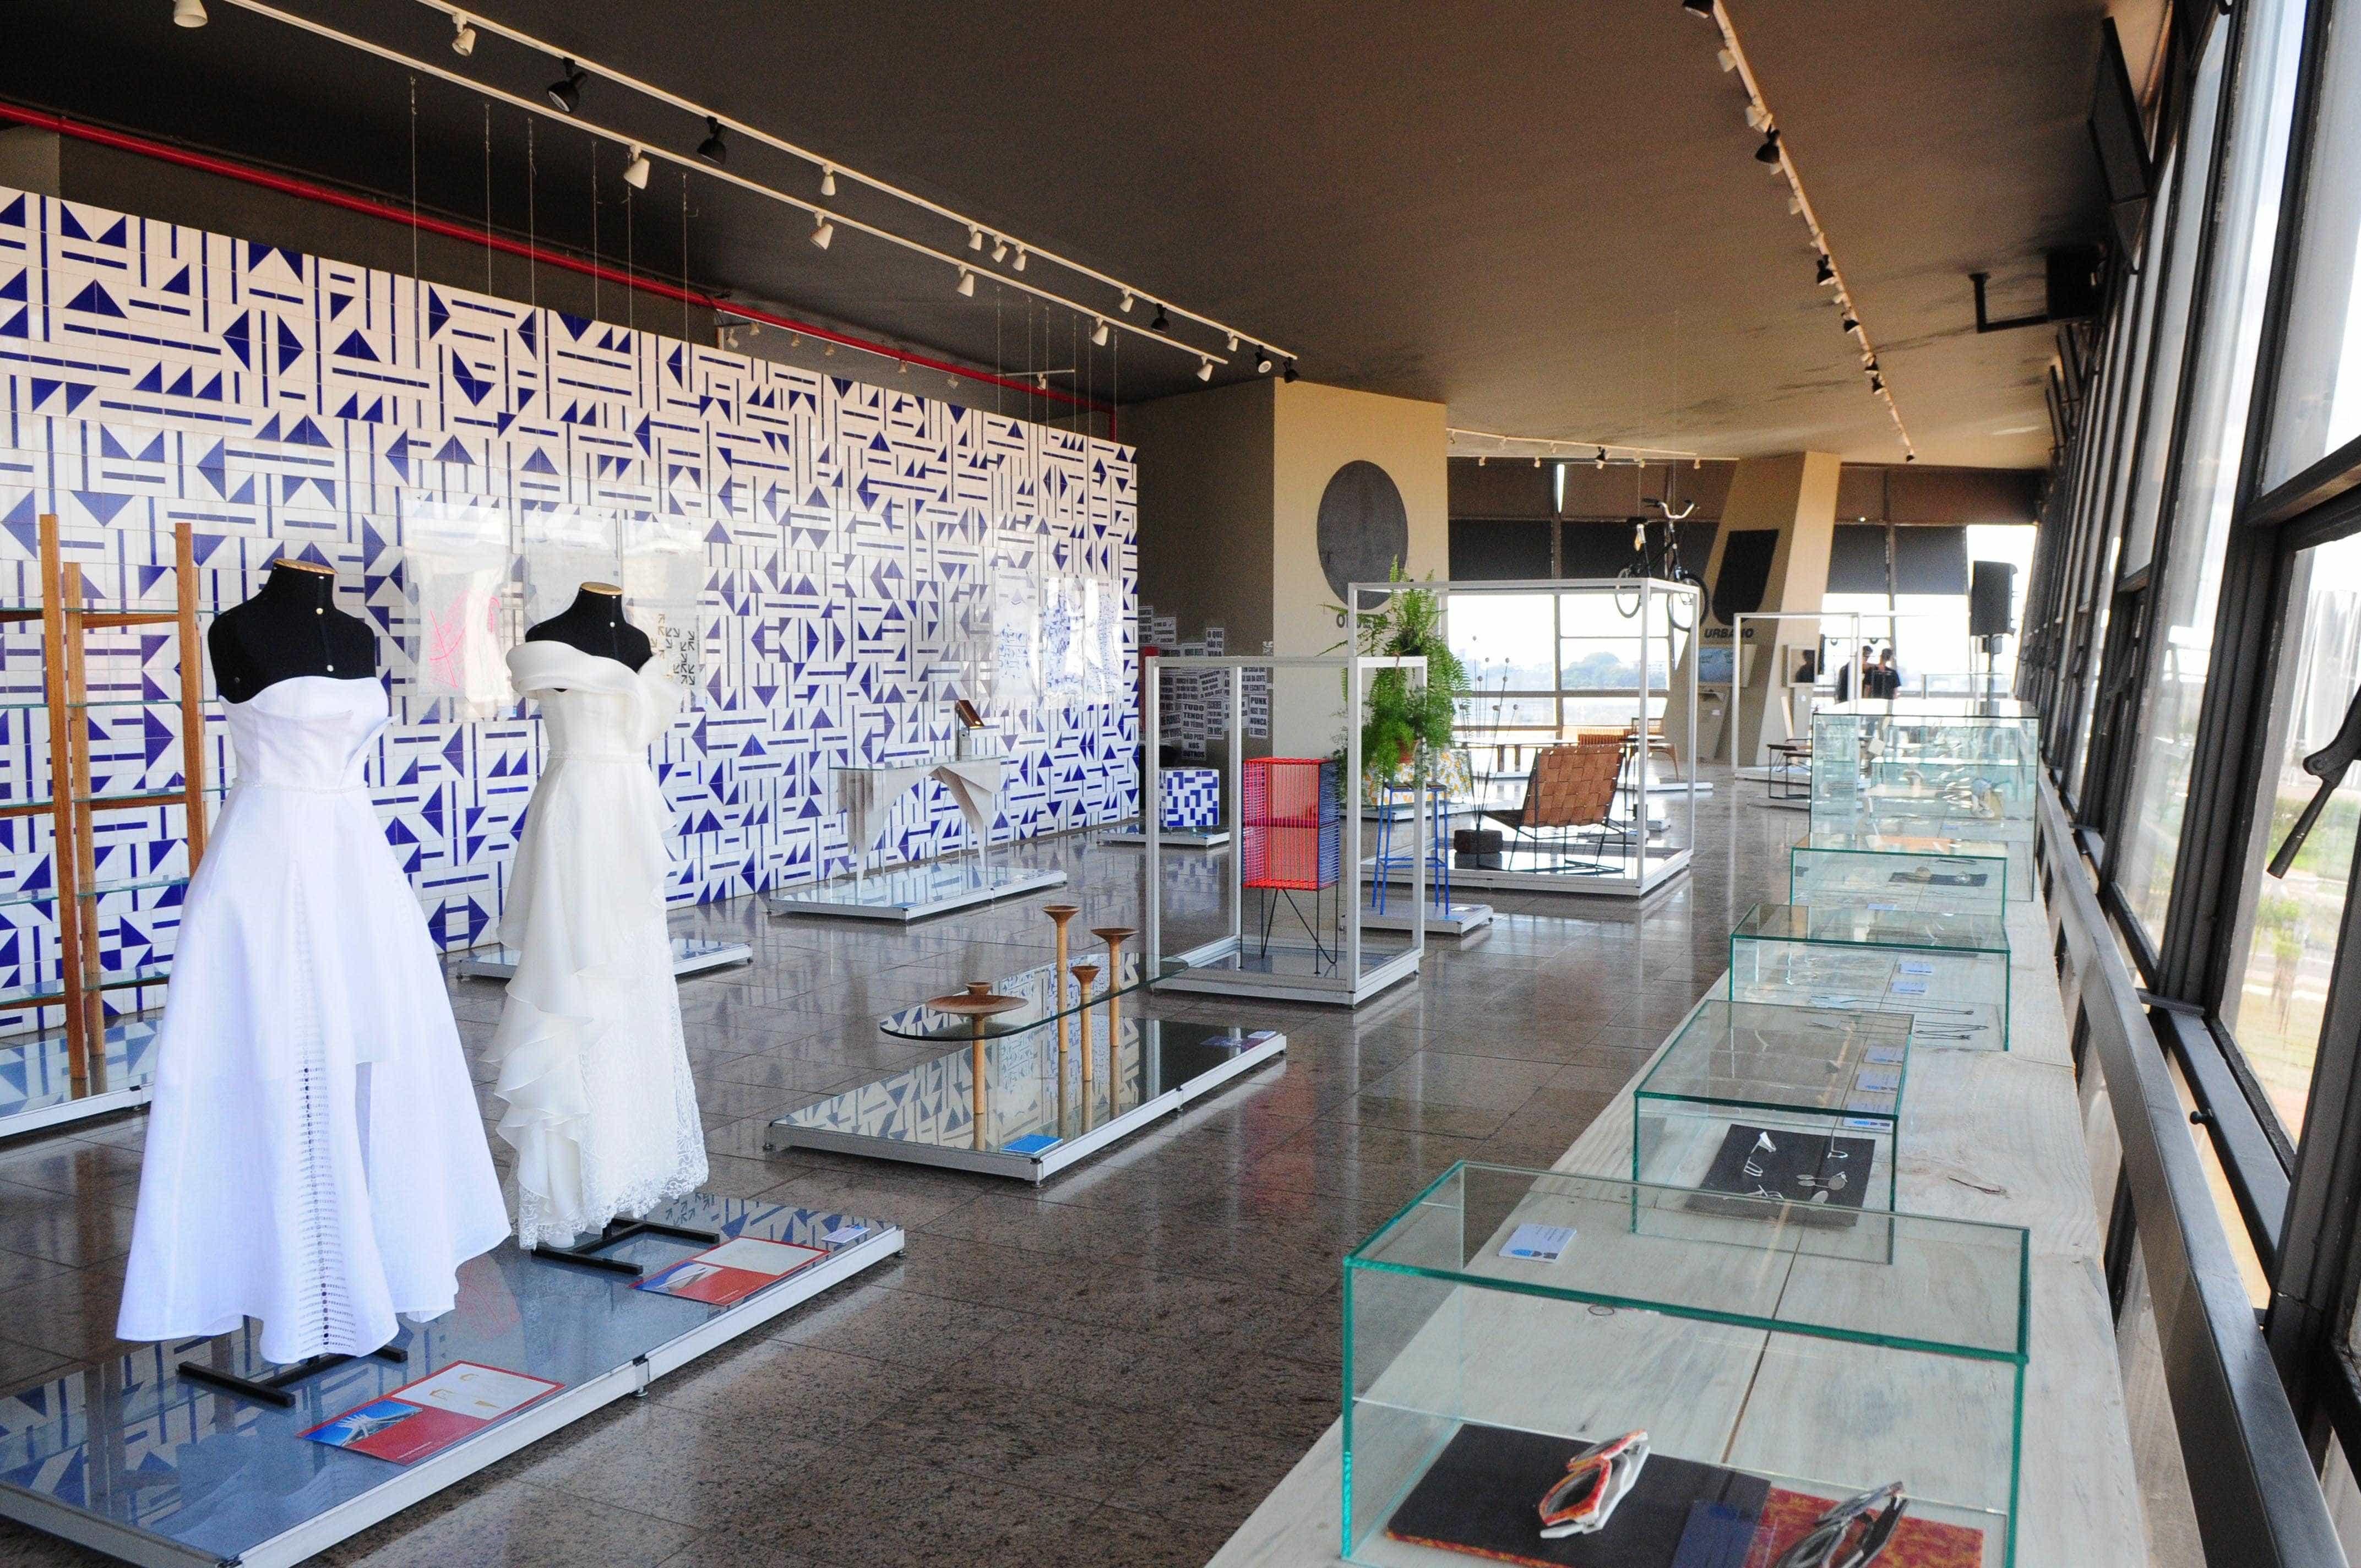 Mostra sobre design 'made in Brasília' reúne obras de 60 artistas